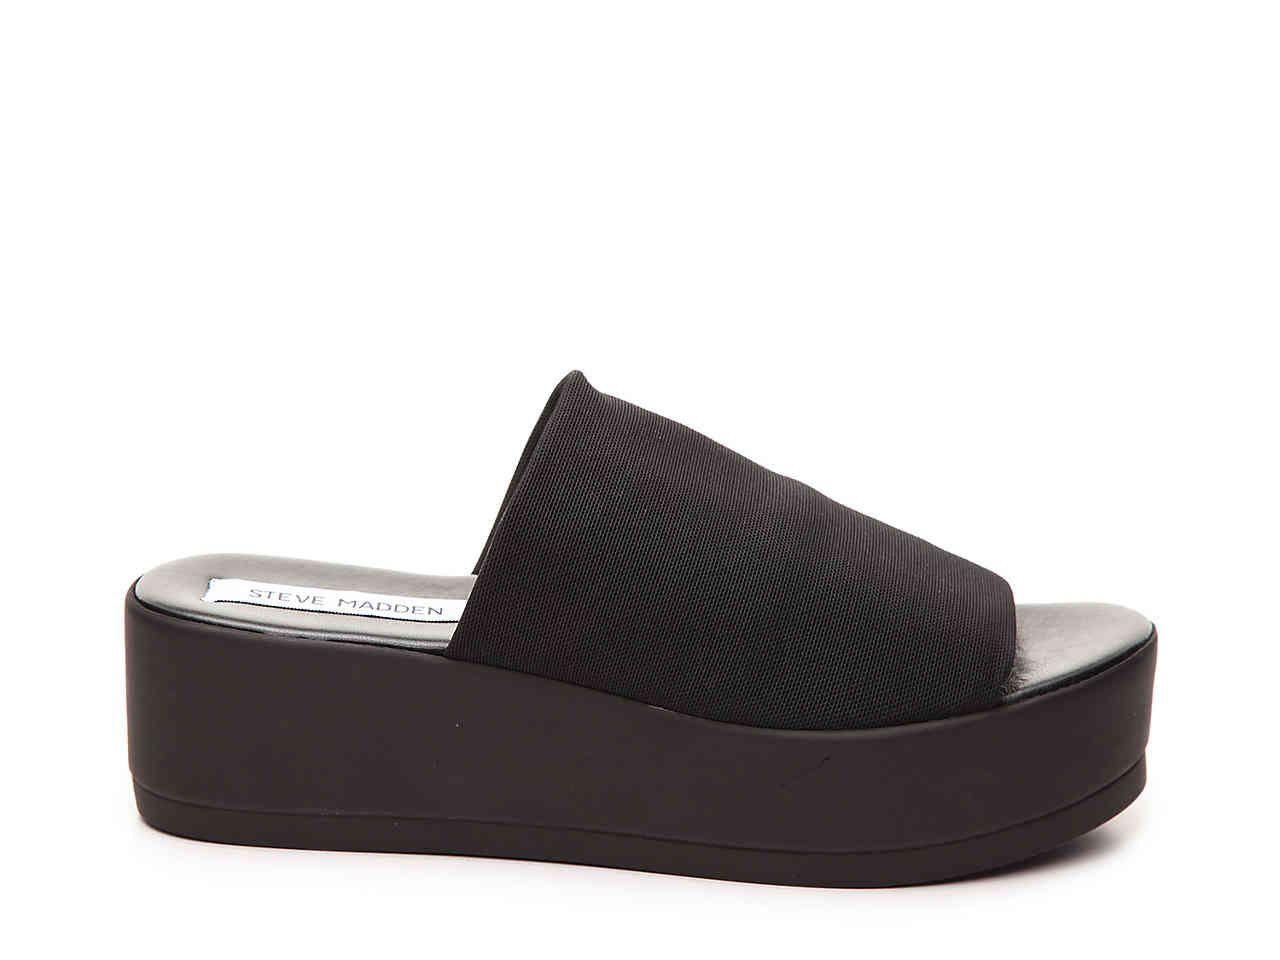 da6ad6857ef Steve madden slinky platform sandal womens shoes clothes jpg 1280x960 Slinky  steve madden loafer